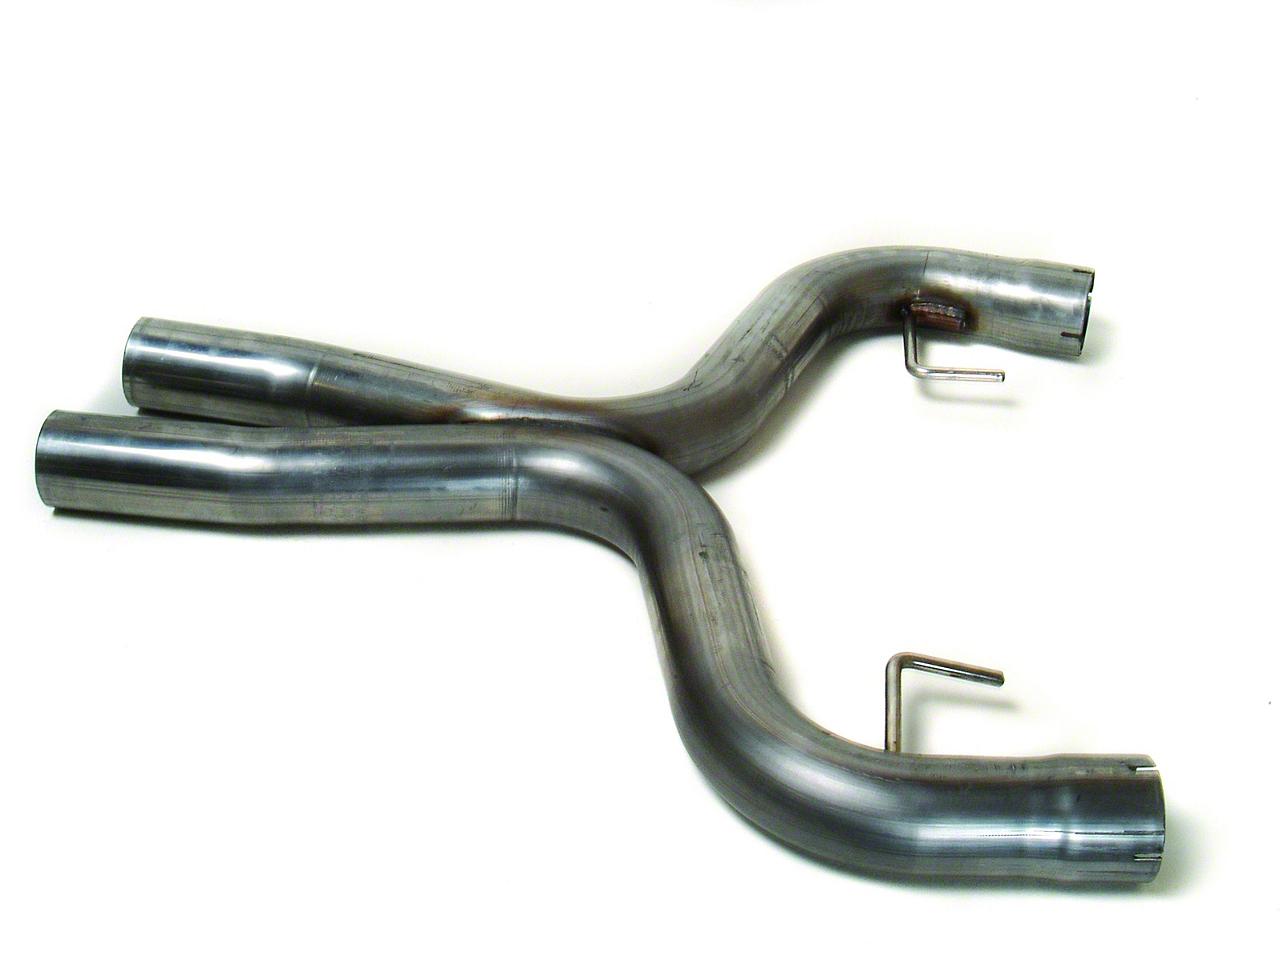 MAC Cut and Clamp X-Pipe (05-10 GT)